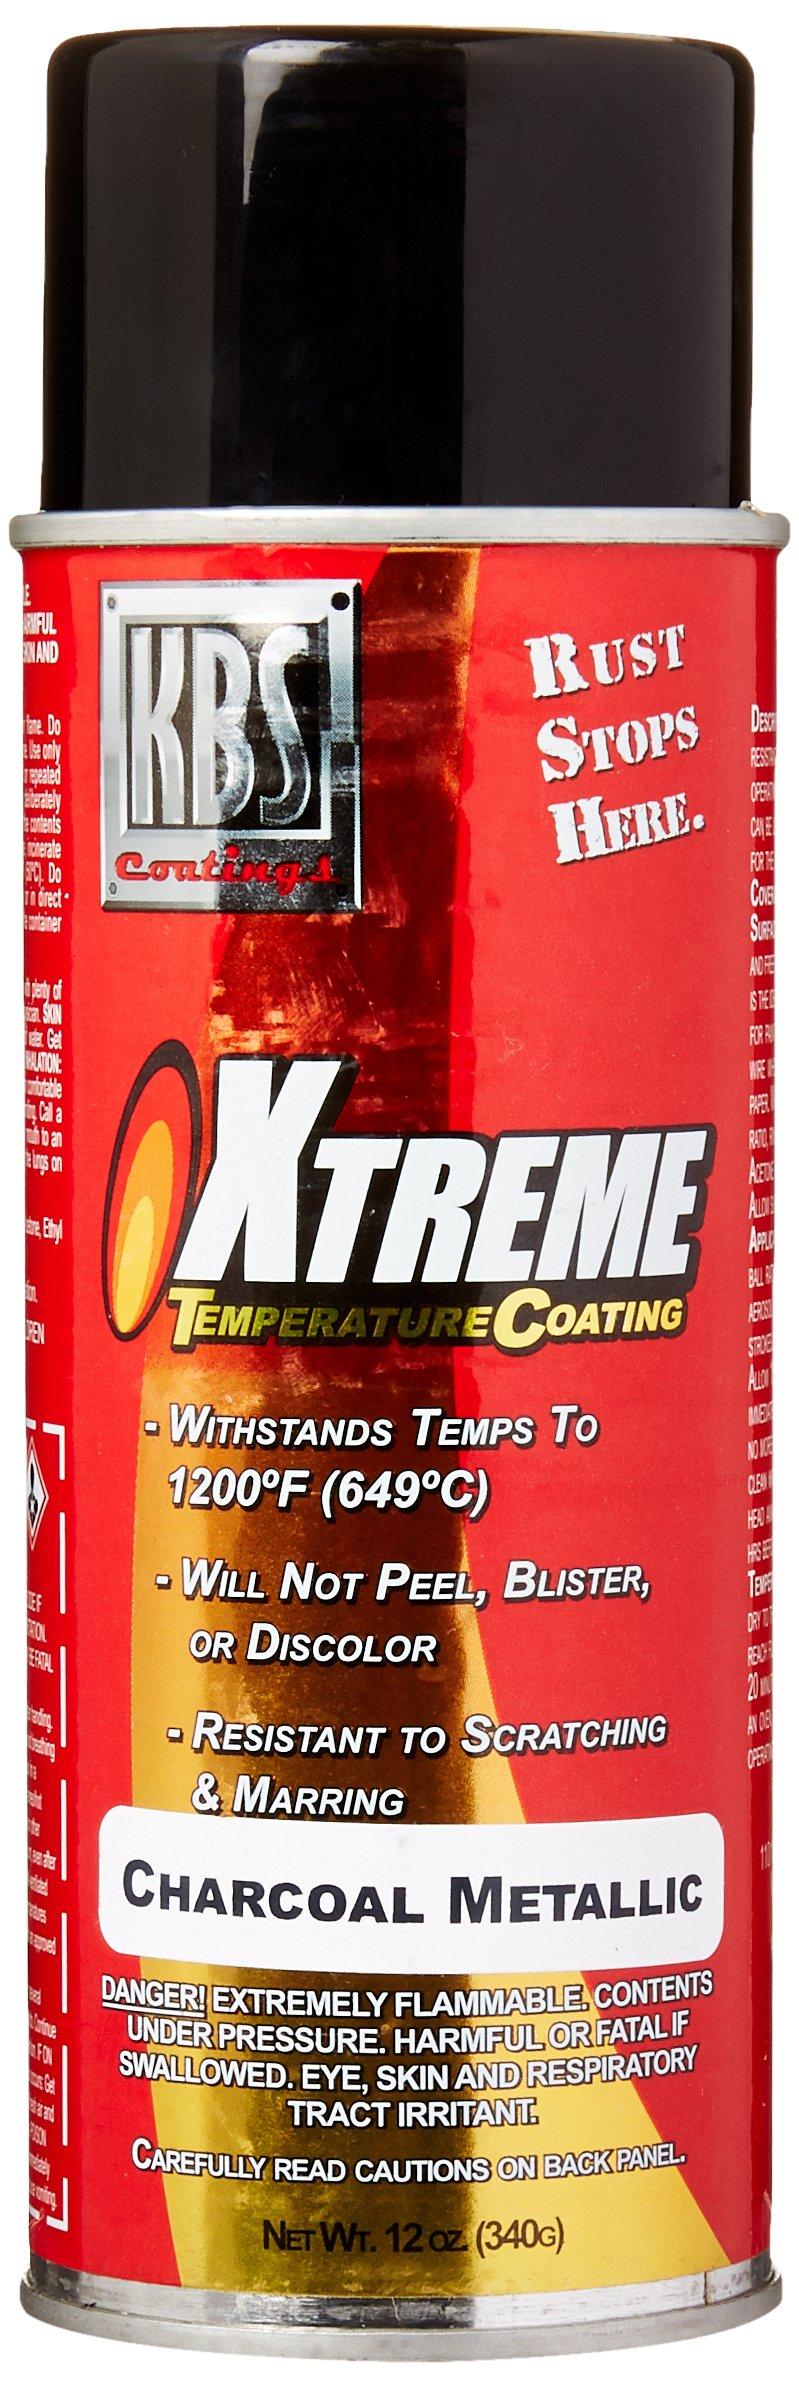 KBS Coatings 65125 Charcoal Metallic Xtreme Temperature Coating - 12 fl. oz.